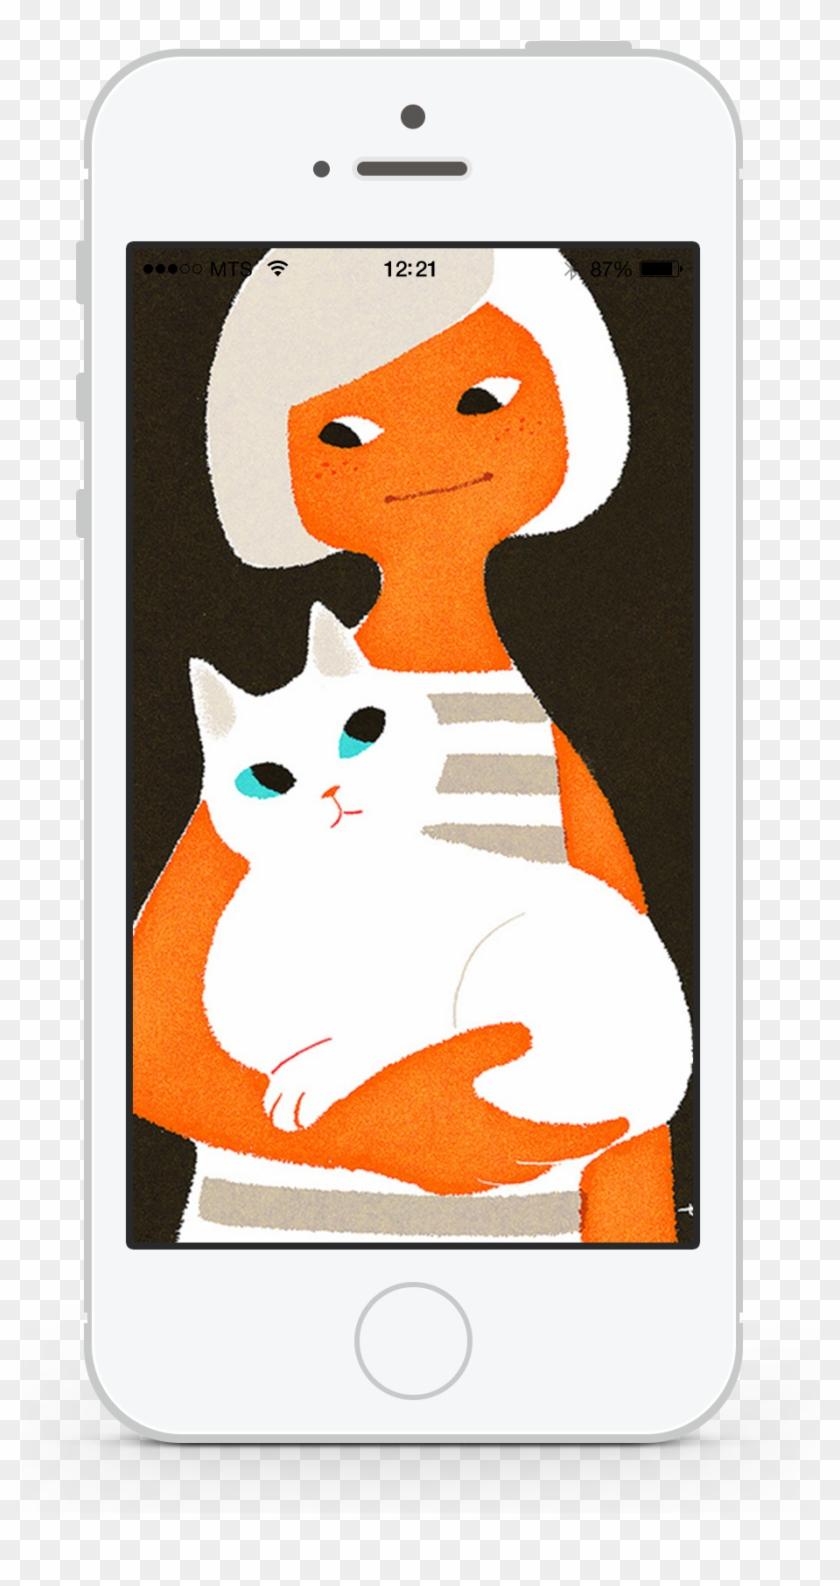 Cat Wallpaper 4 Tumblr Mai0tje0fq1r73k9mo1 Cat Free Transparent